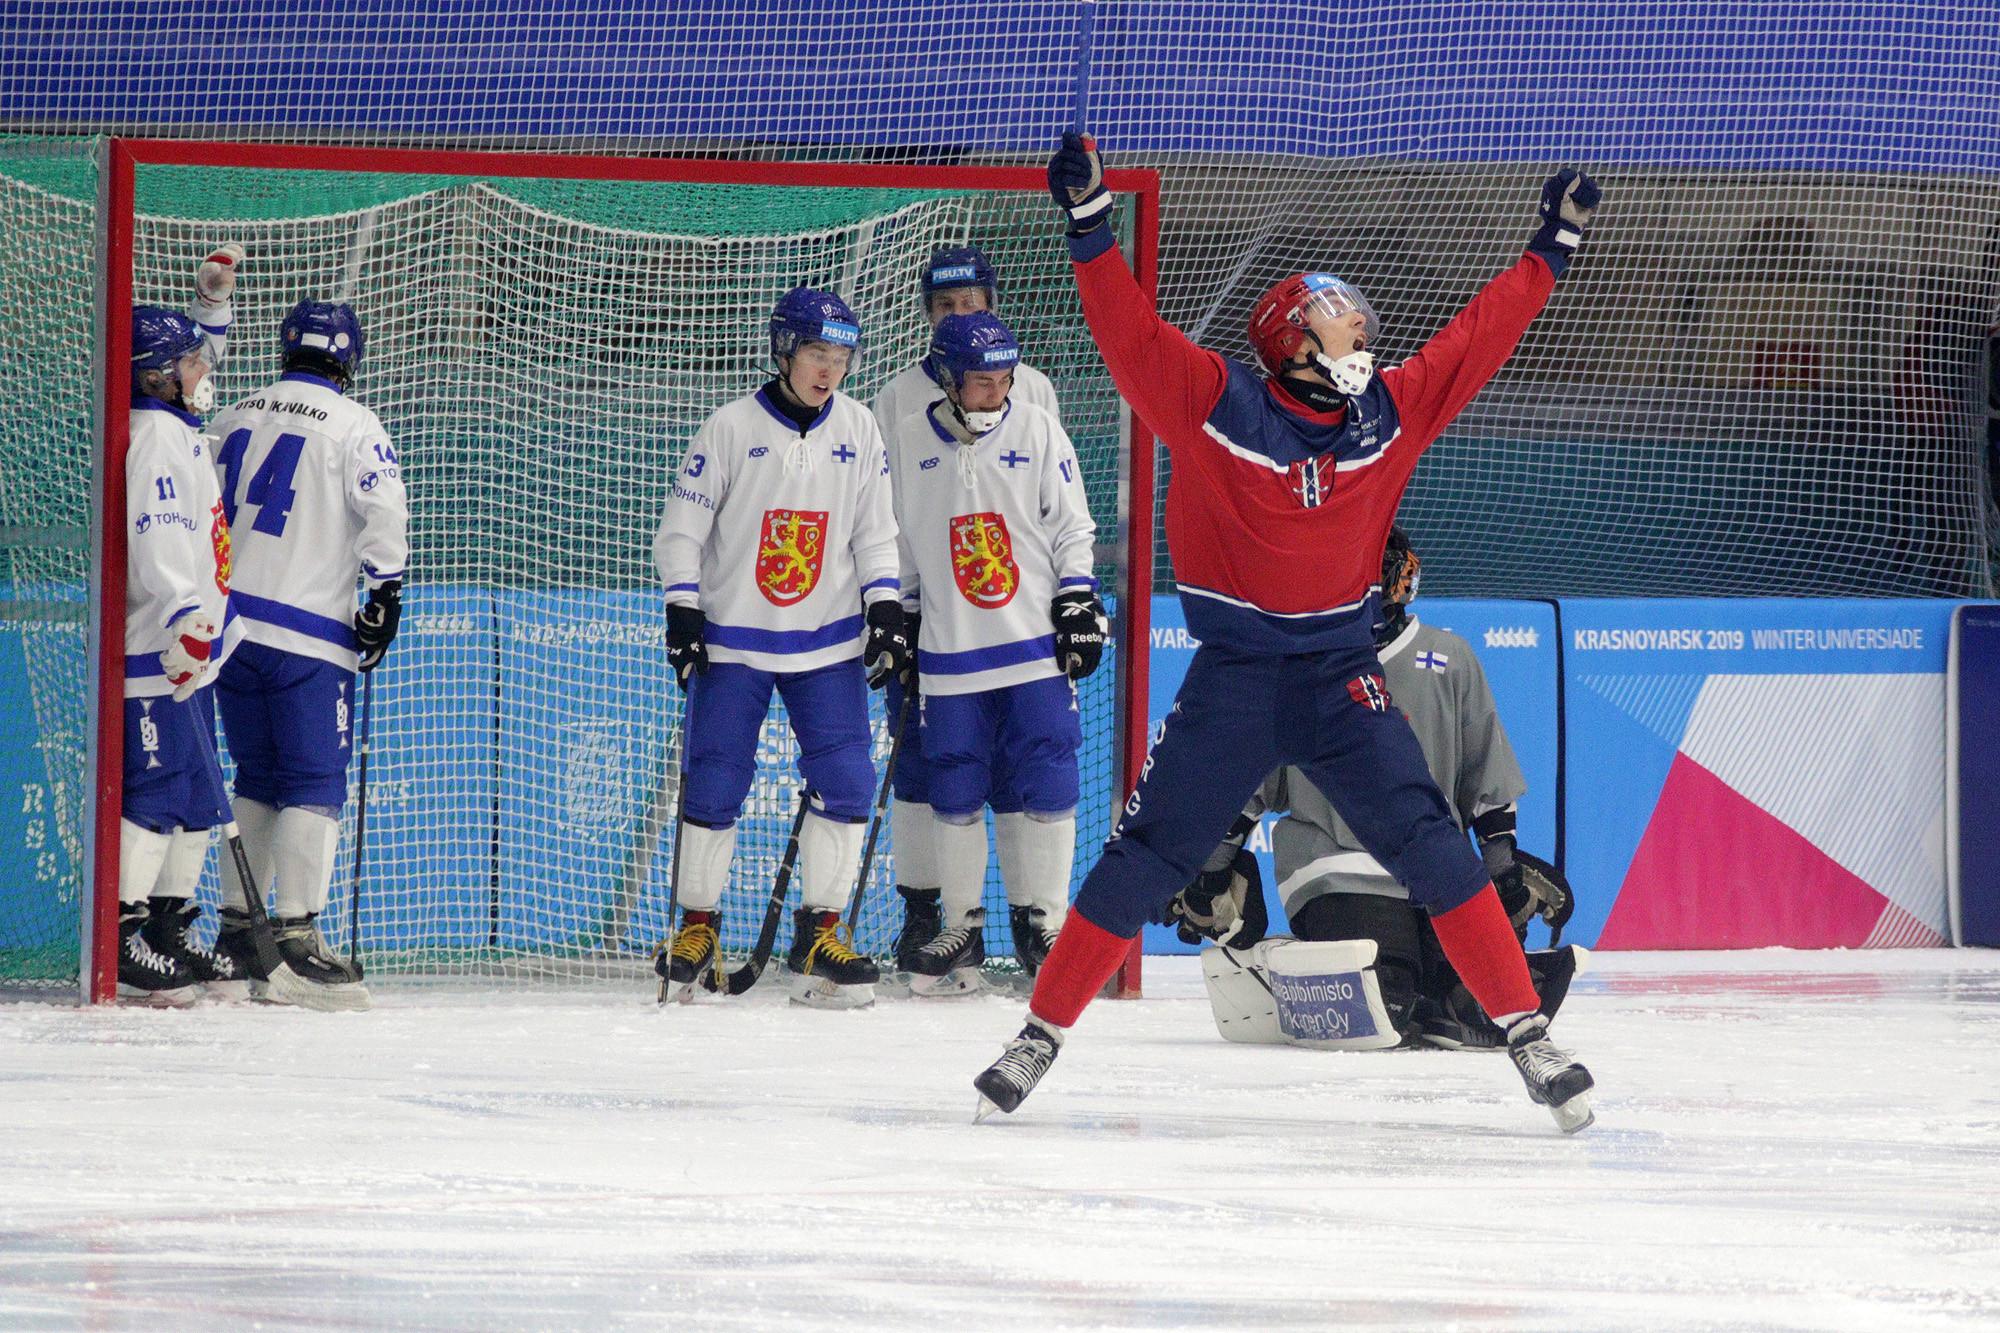 Norway took the bandy bronze medal following their victory against Finland ©Krasnoyarsk 2019